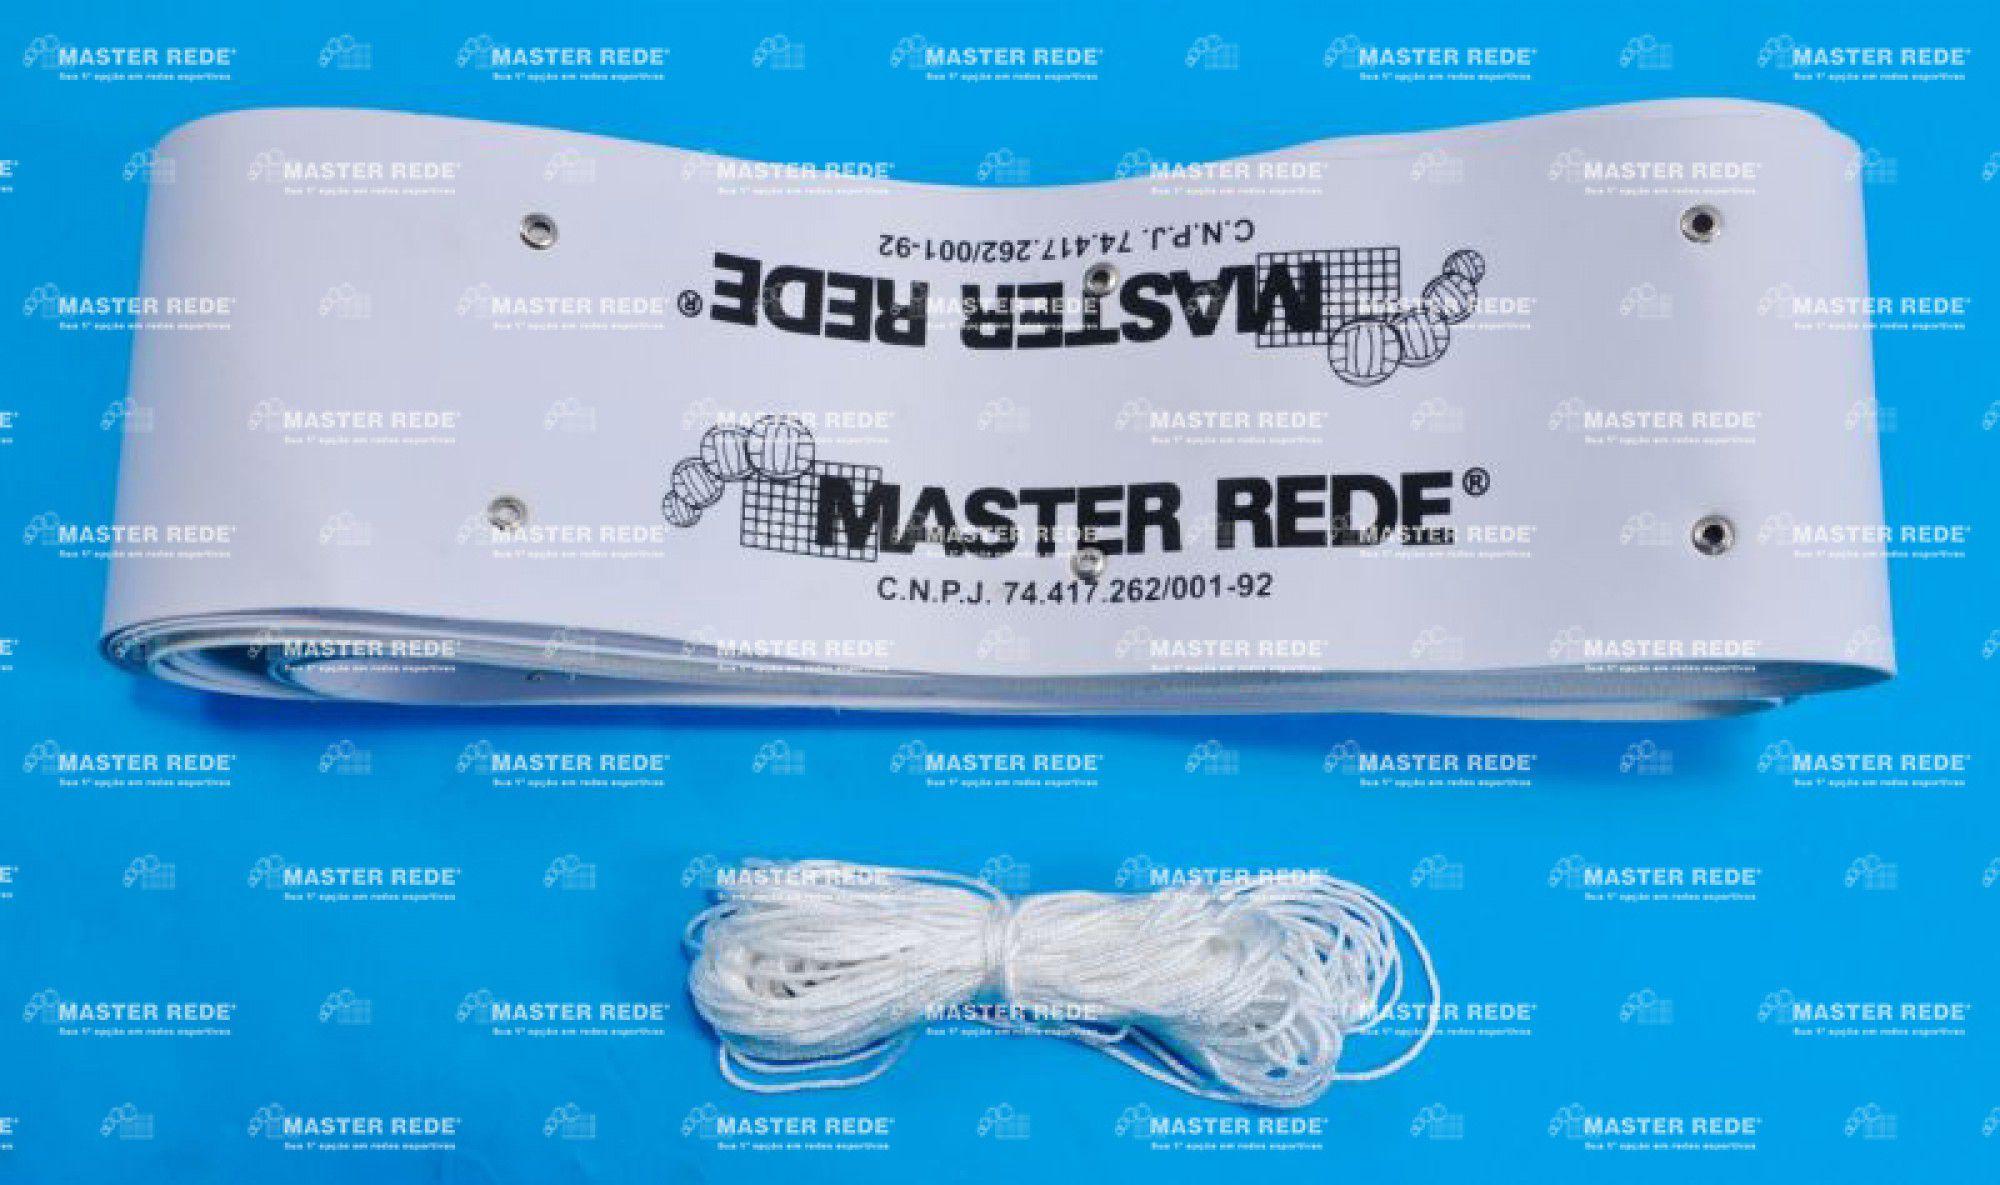 Faixa Superior Para Rede de Tenis Master Rede (Debrum)   - REAL ESPORTE